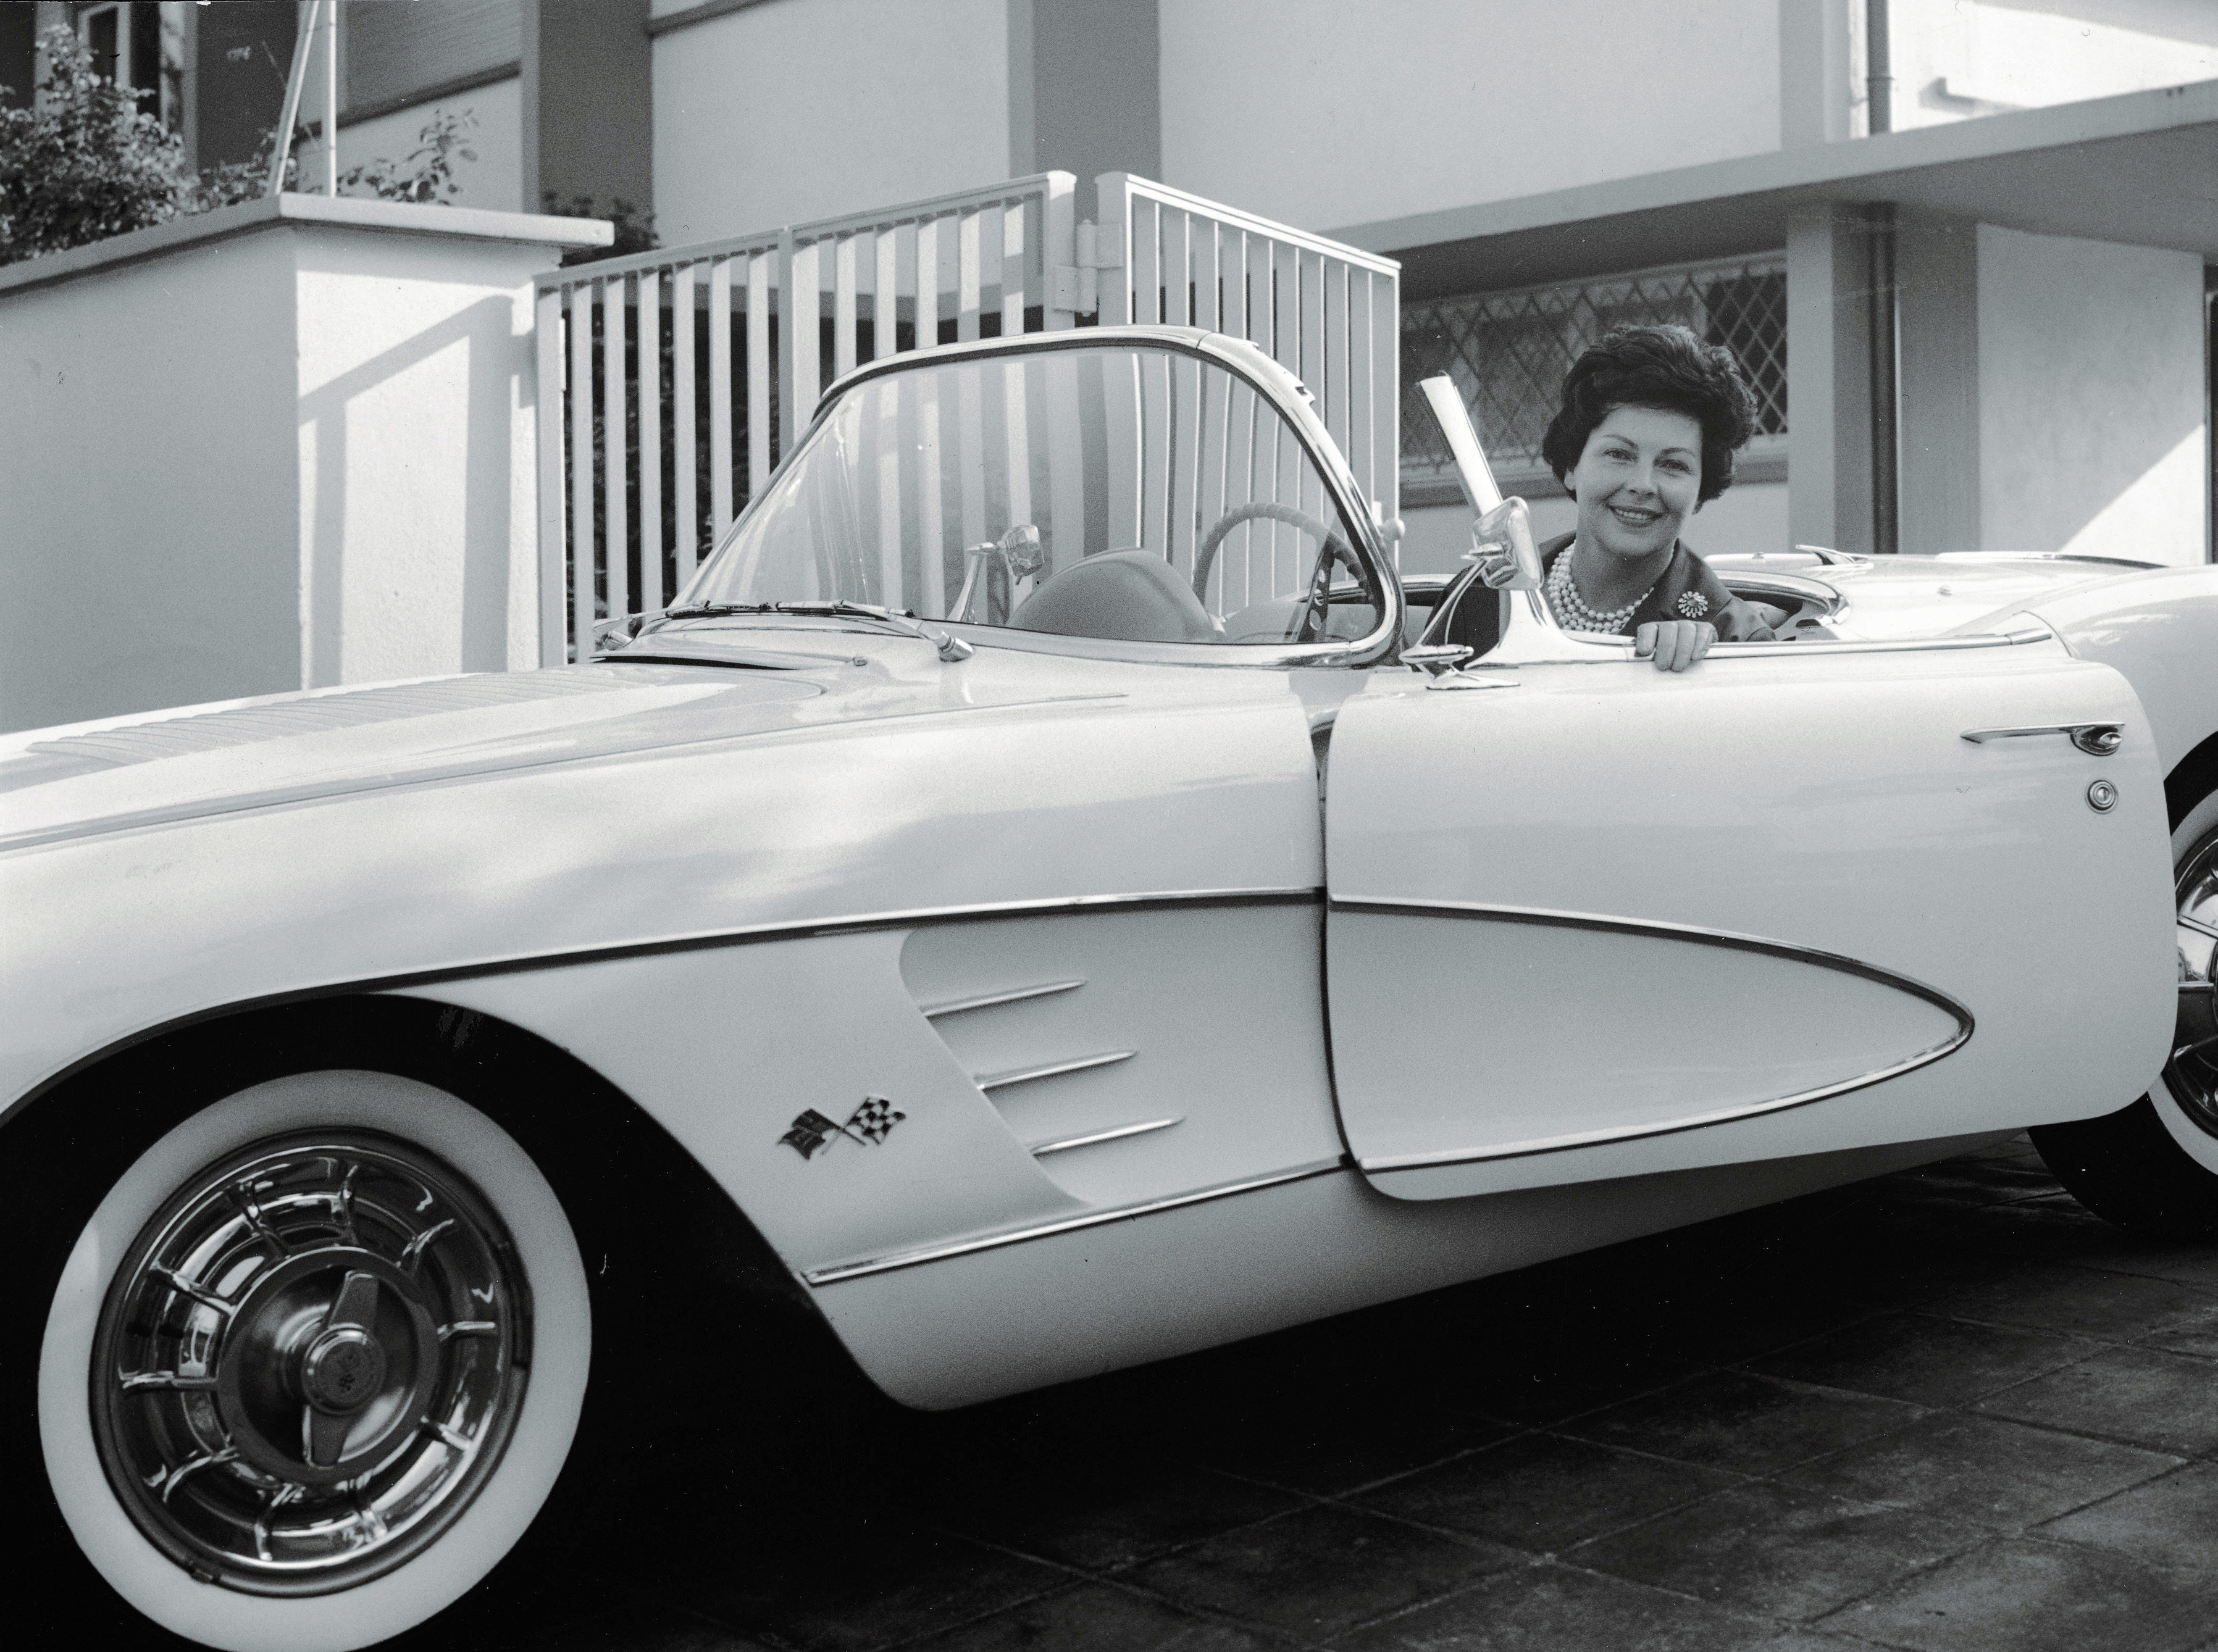 File:Aenne Burda in Chevrolet Corvette - 1956.jpg - Wikimedia Commons